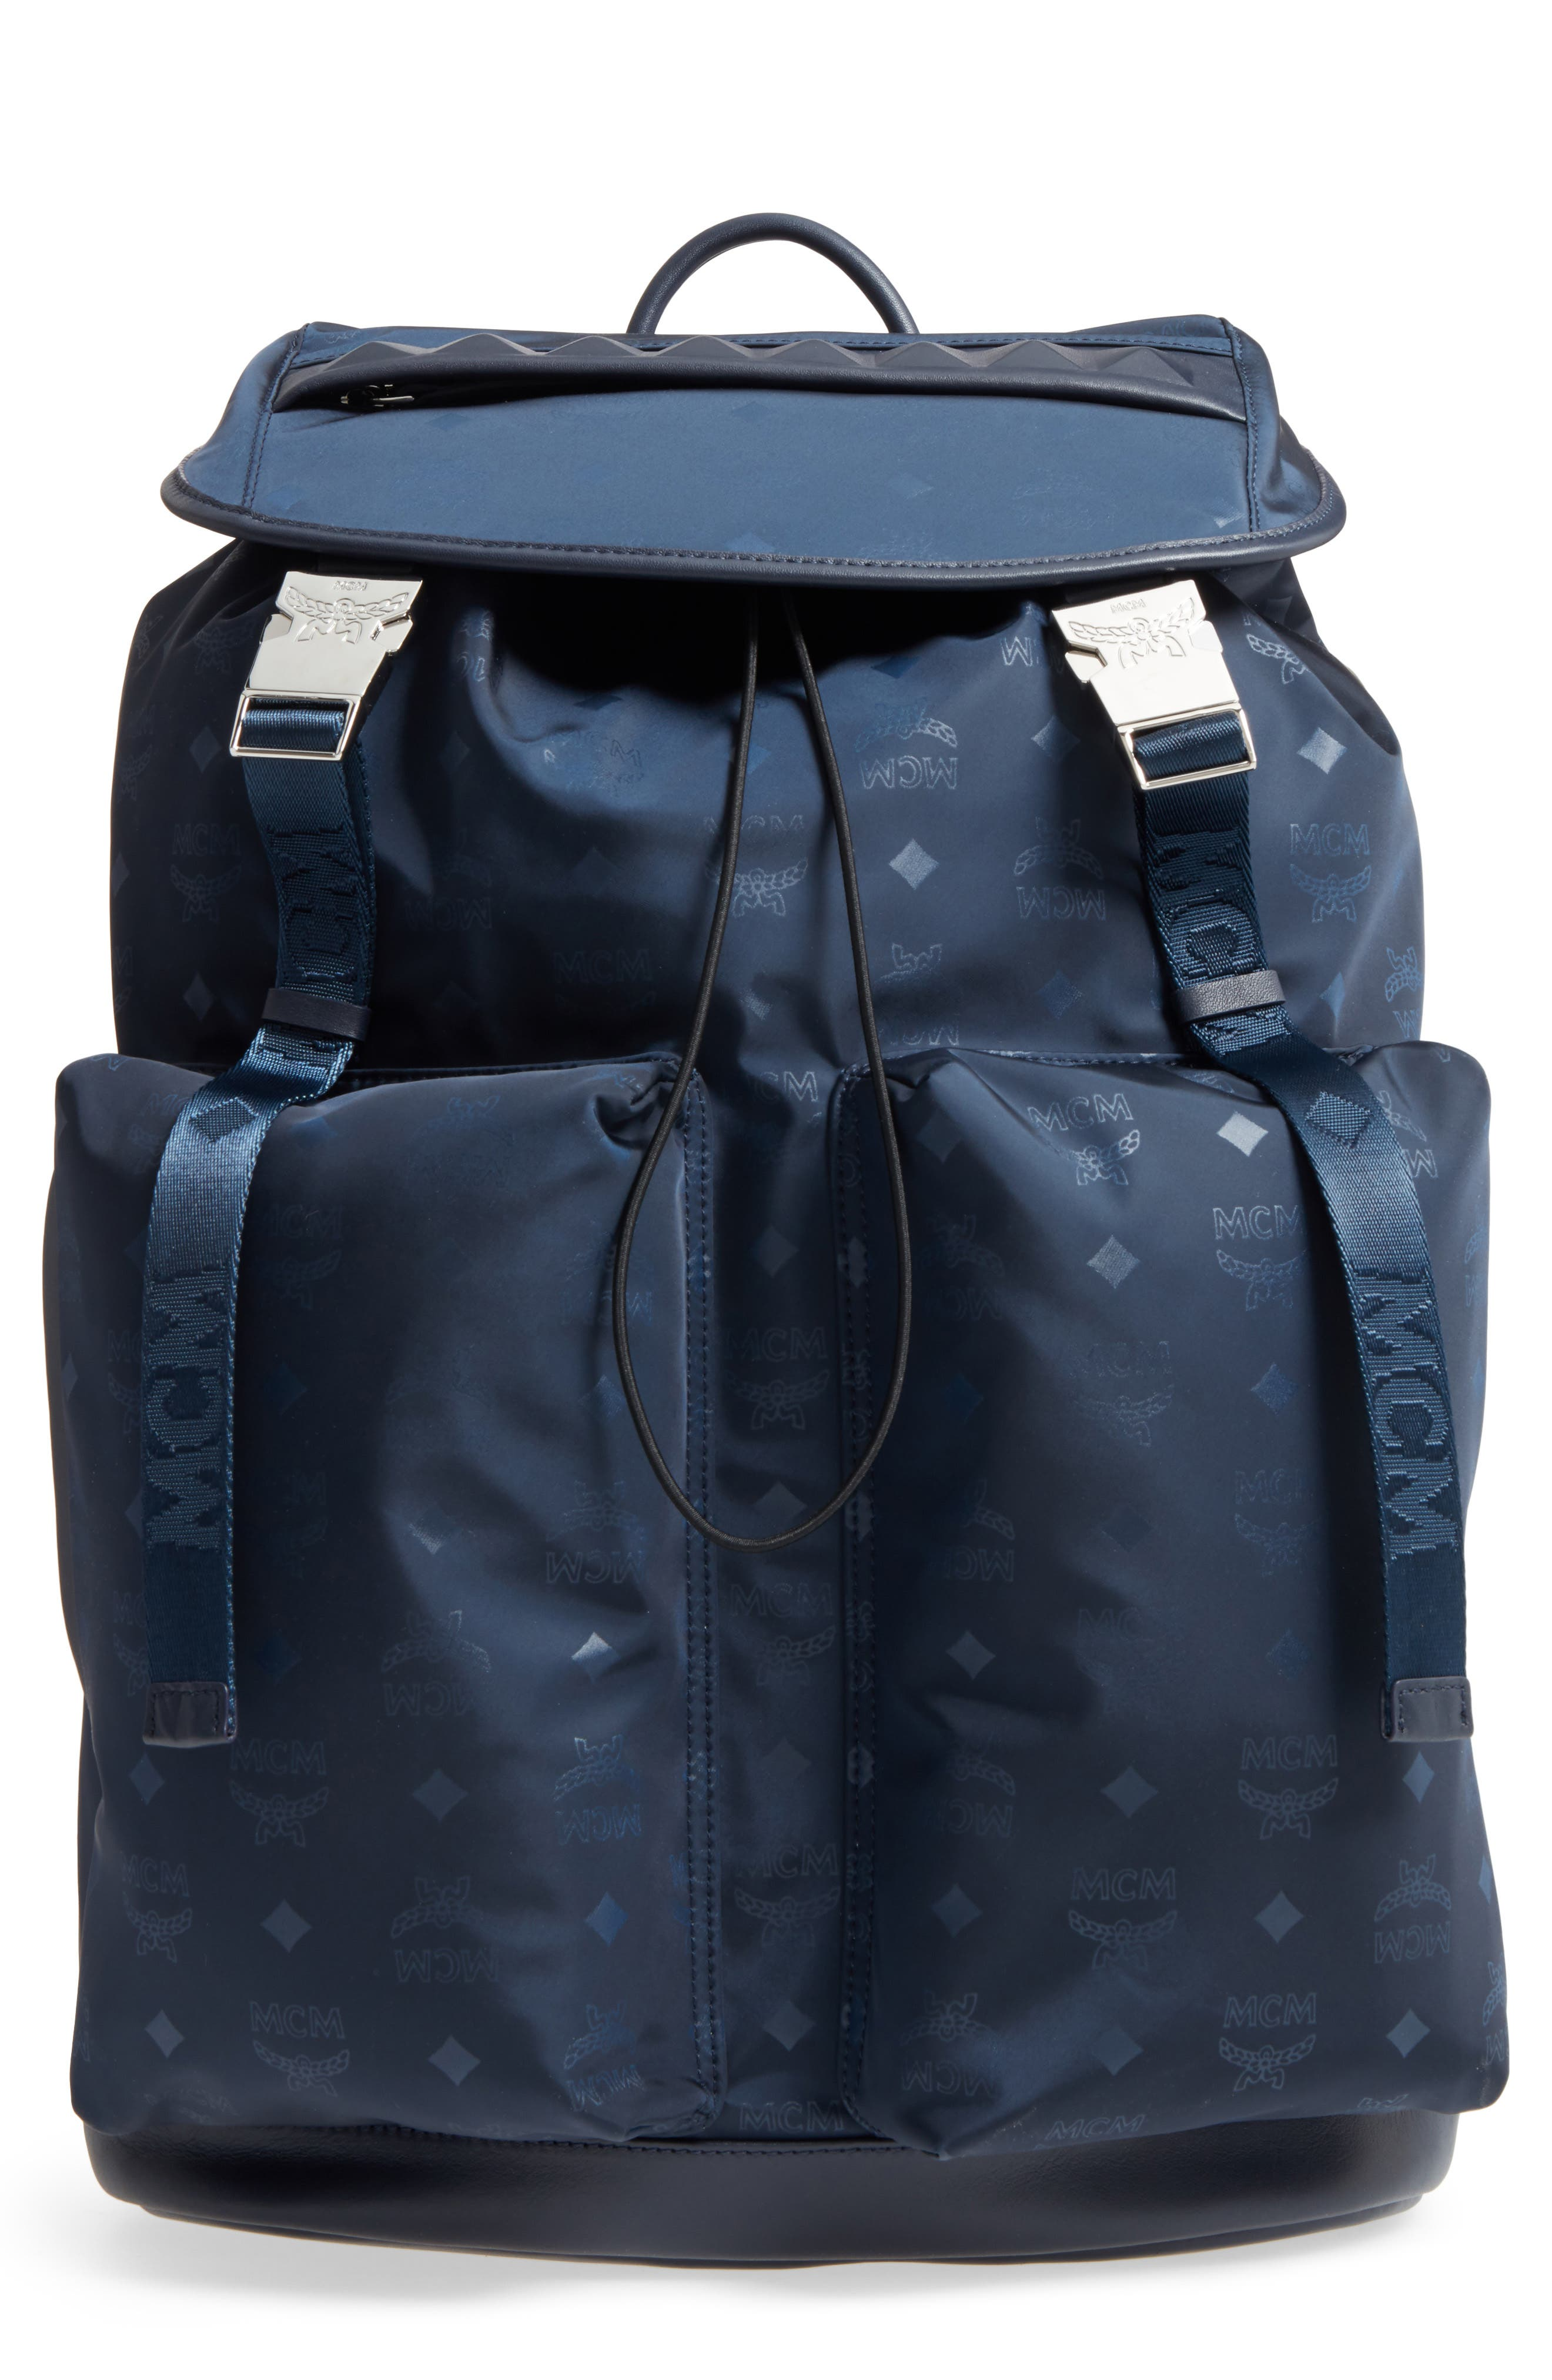 Dieter Backpack,                         Main,                         color, NAVY BLUE